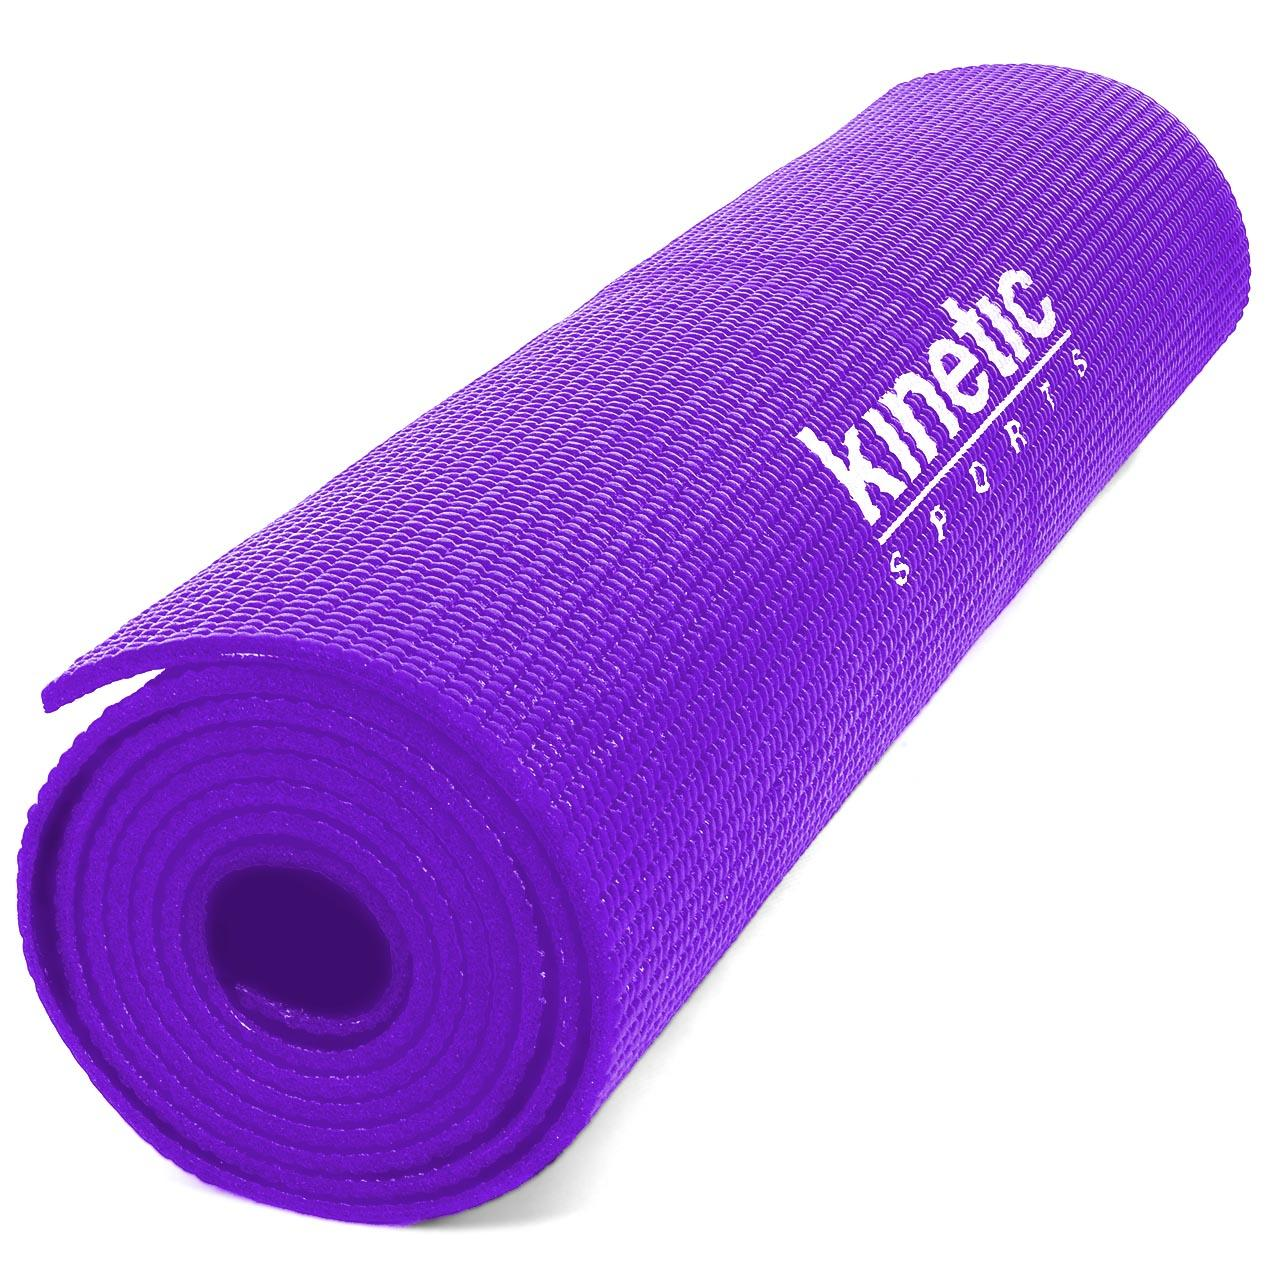 Yogamatte-Gymnastikmatte-Bodenmatte-Fitnessmatte-Yoga-Sport-Matte-Turnmatte-NEU